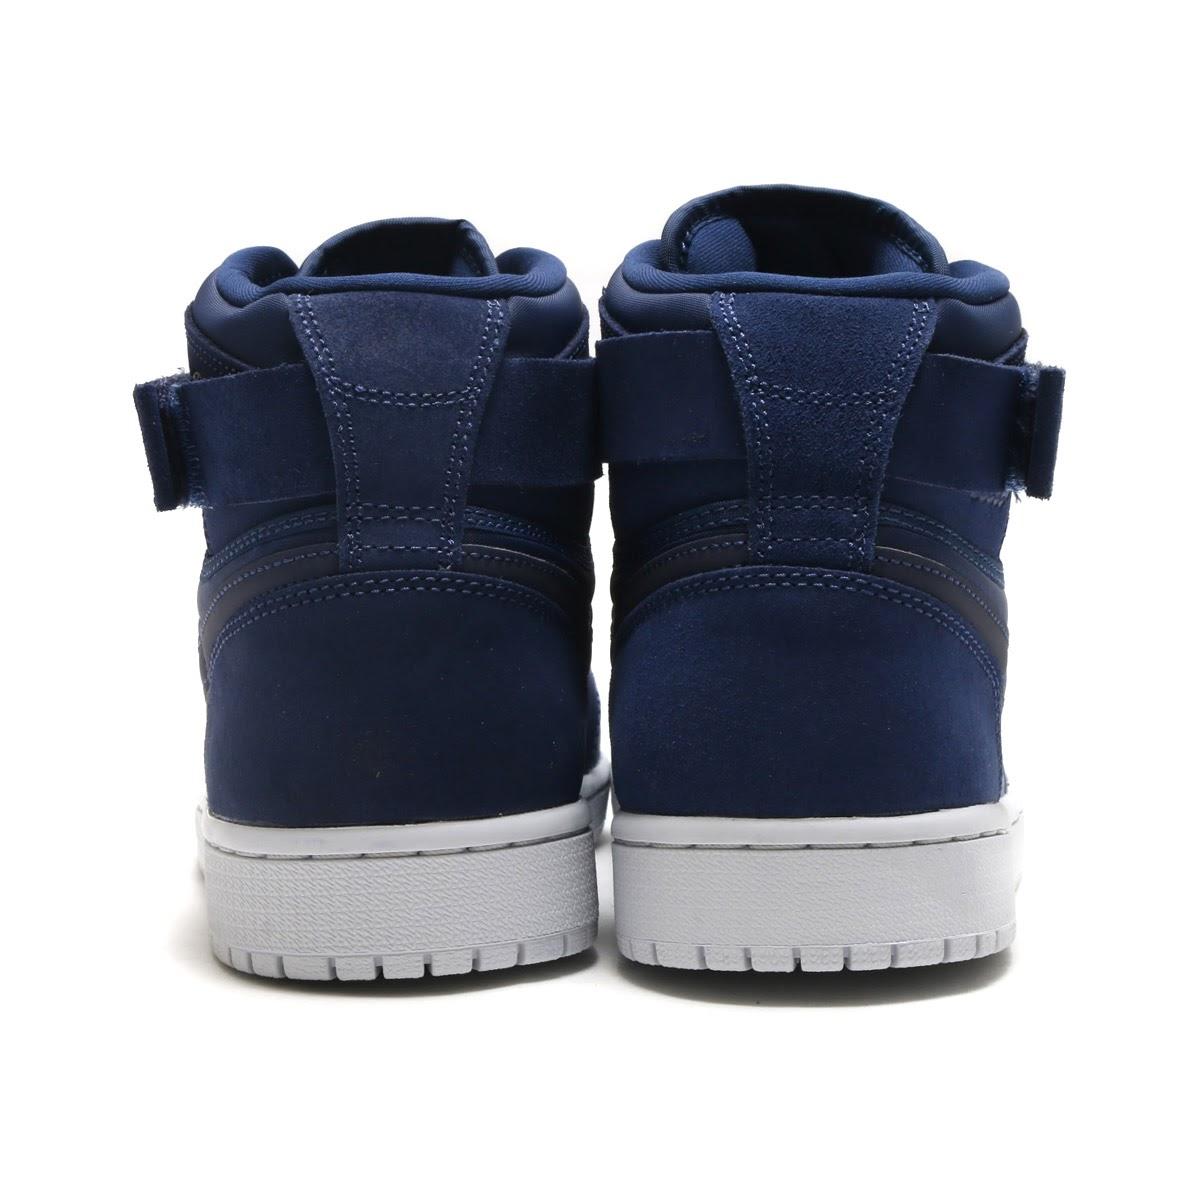 93bc4dfa0345 NIKE AIR JORDAN 1 HIGH STRAP (Nike Air Jordan 1 Heiss trap) (MIDNIGHT NAVY MIDNIGHT  NAVY)